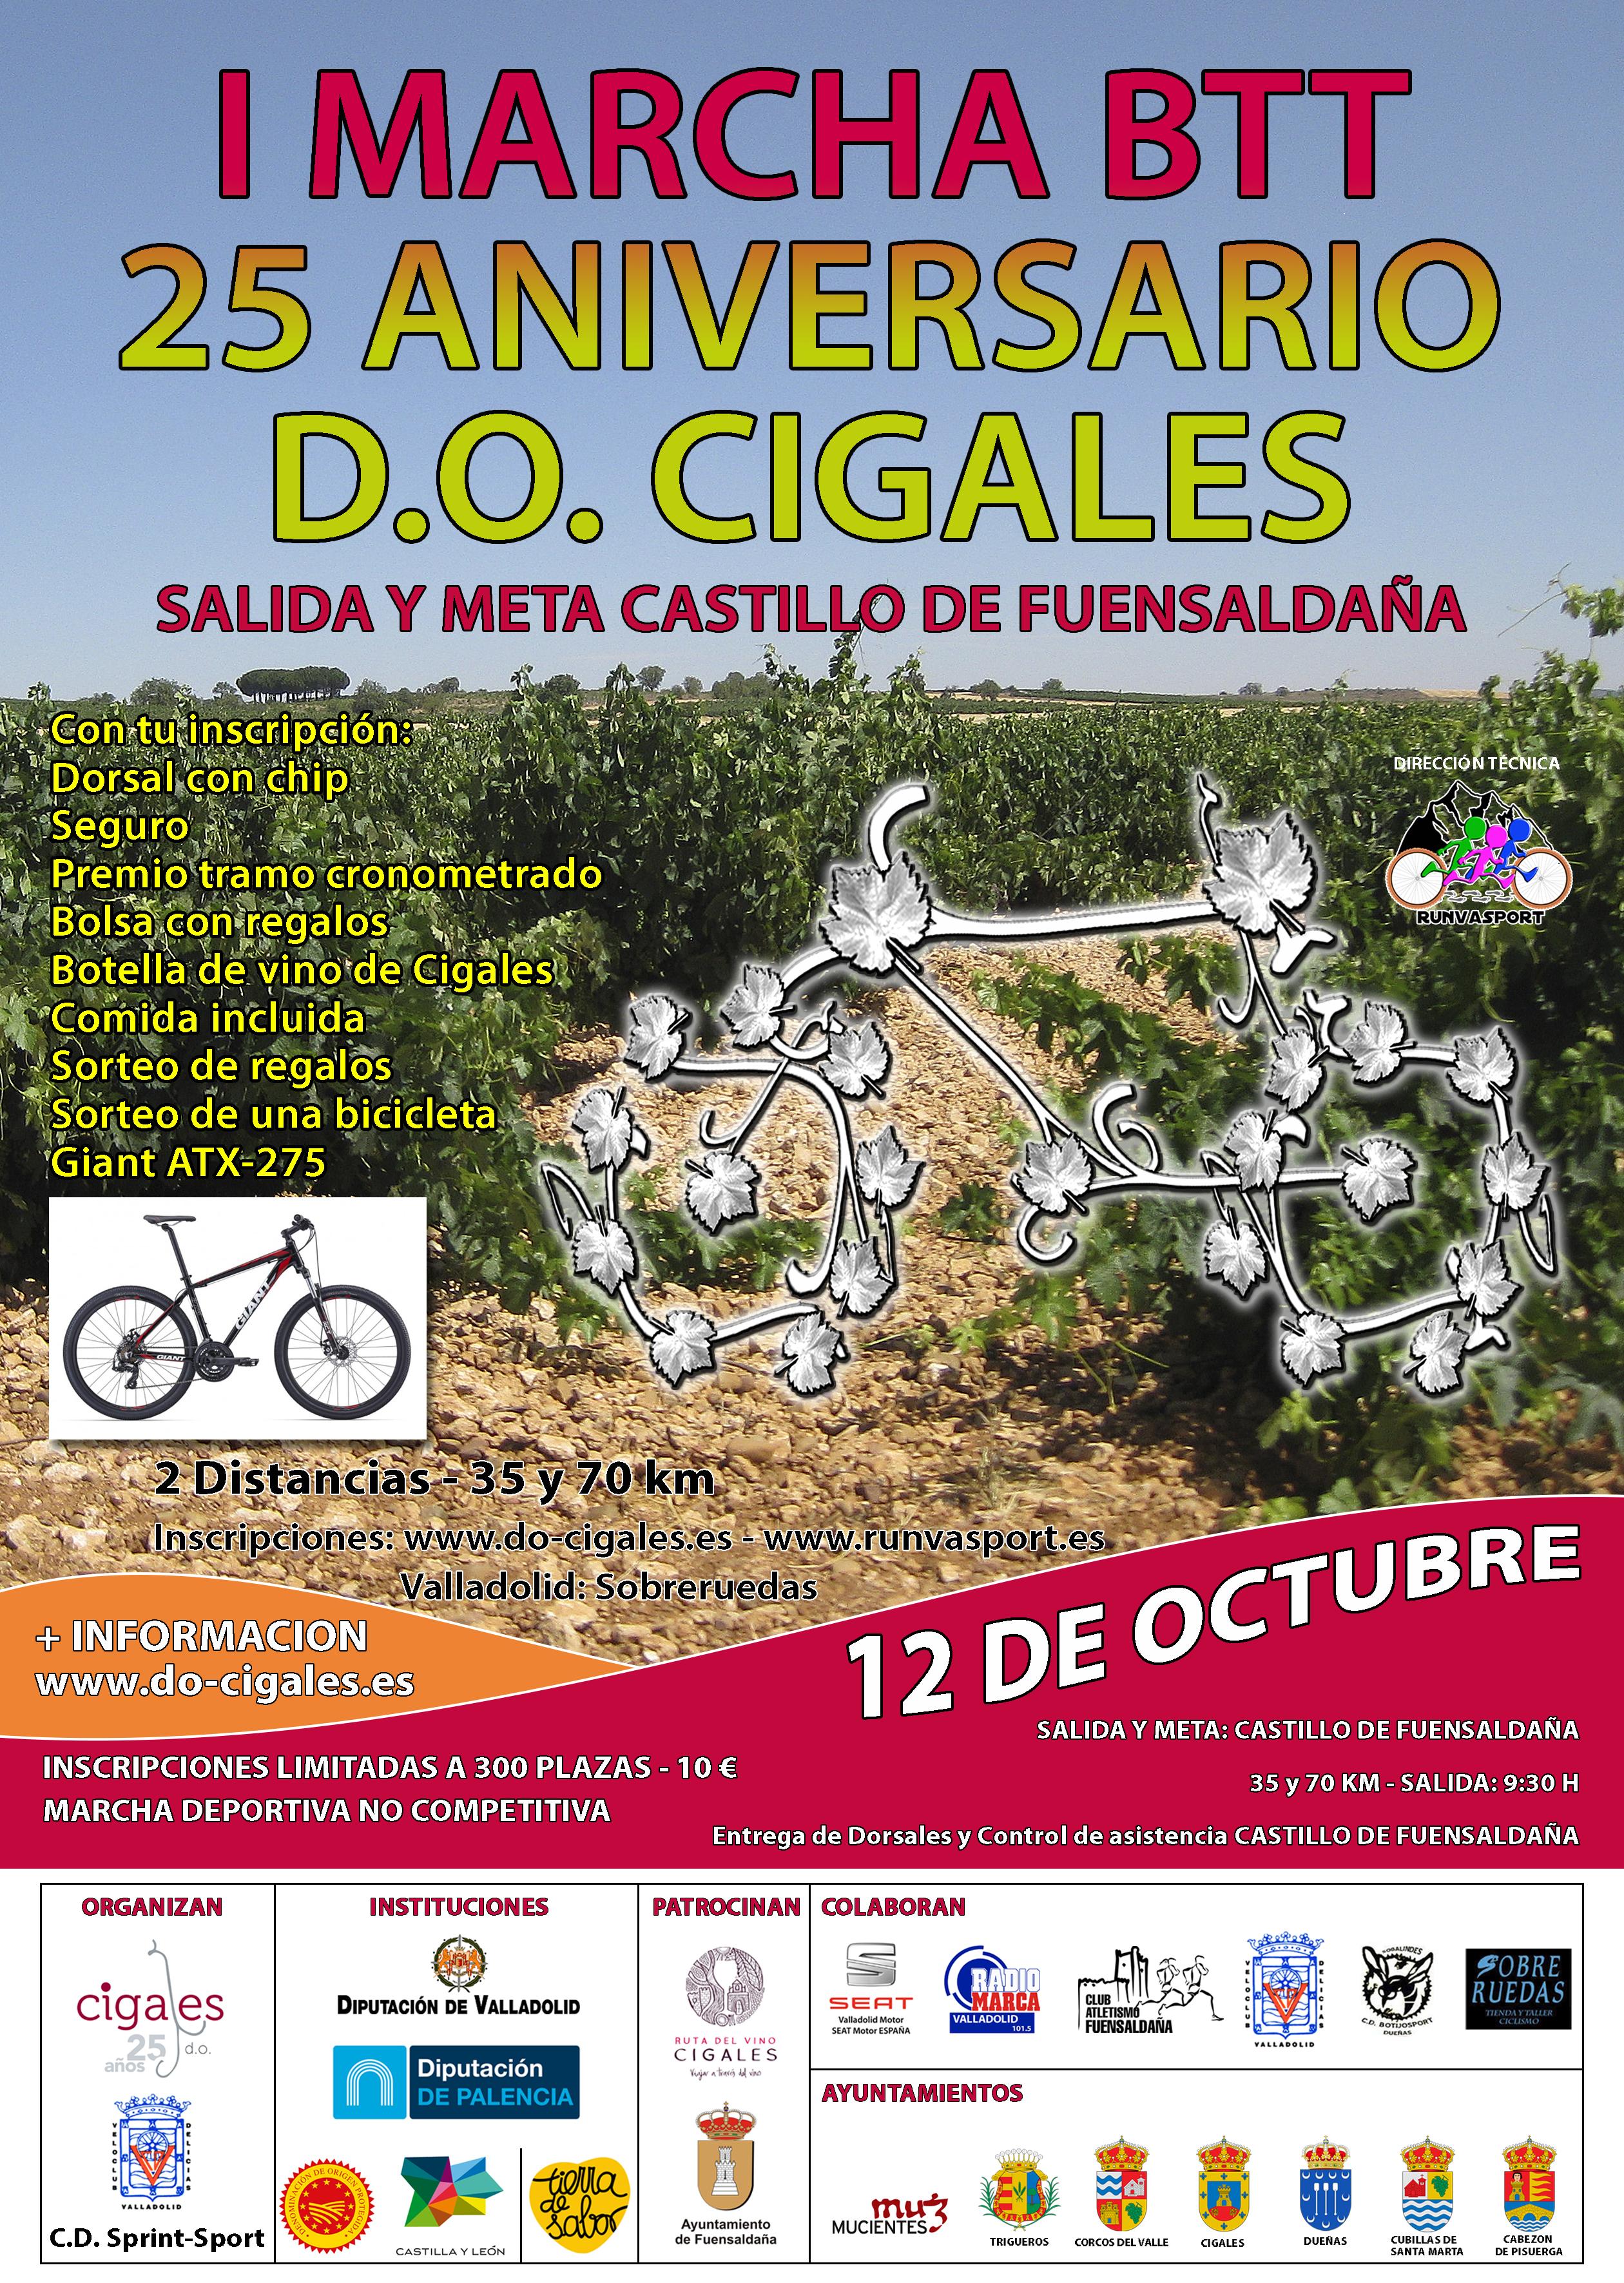 La DO Cigales estrena su primera ruta BTT el 12 de octubre